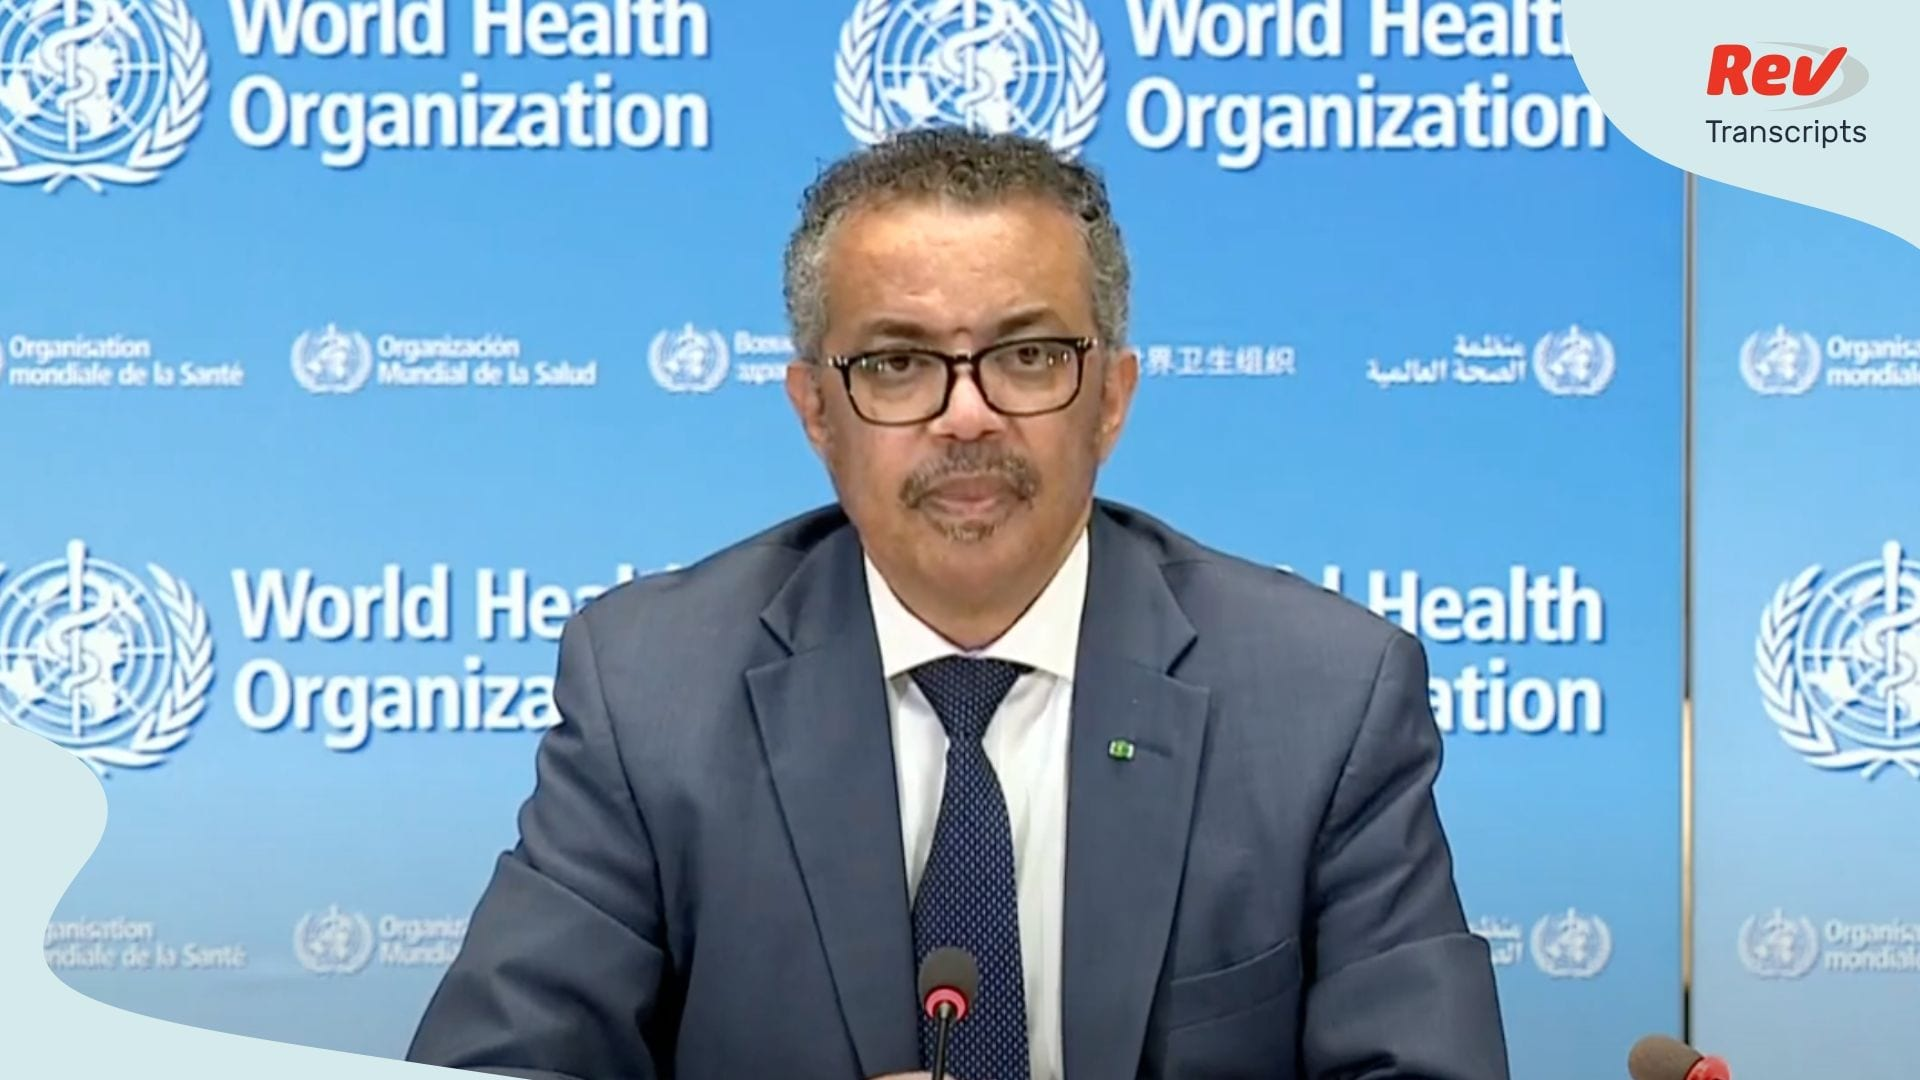 World Health Organization WHO Press Conference June 3